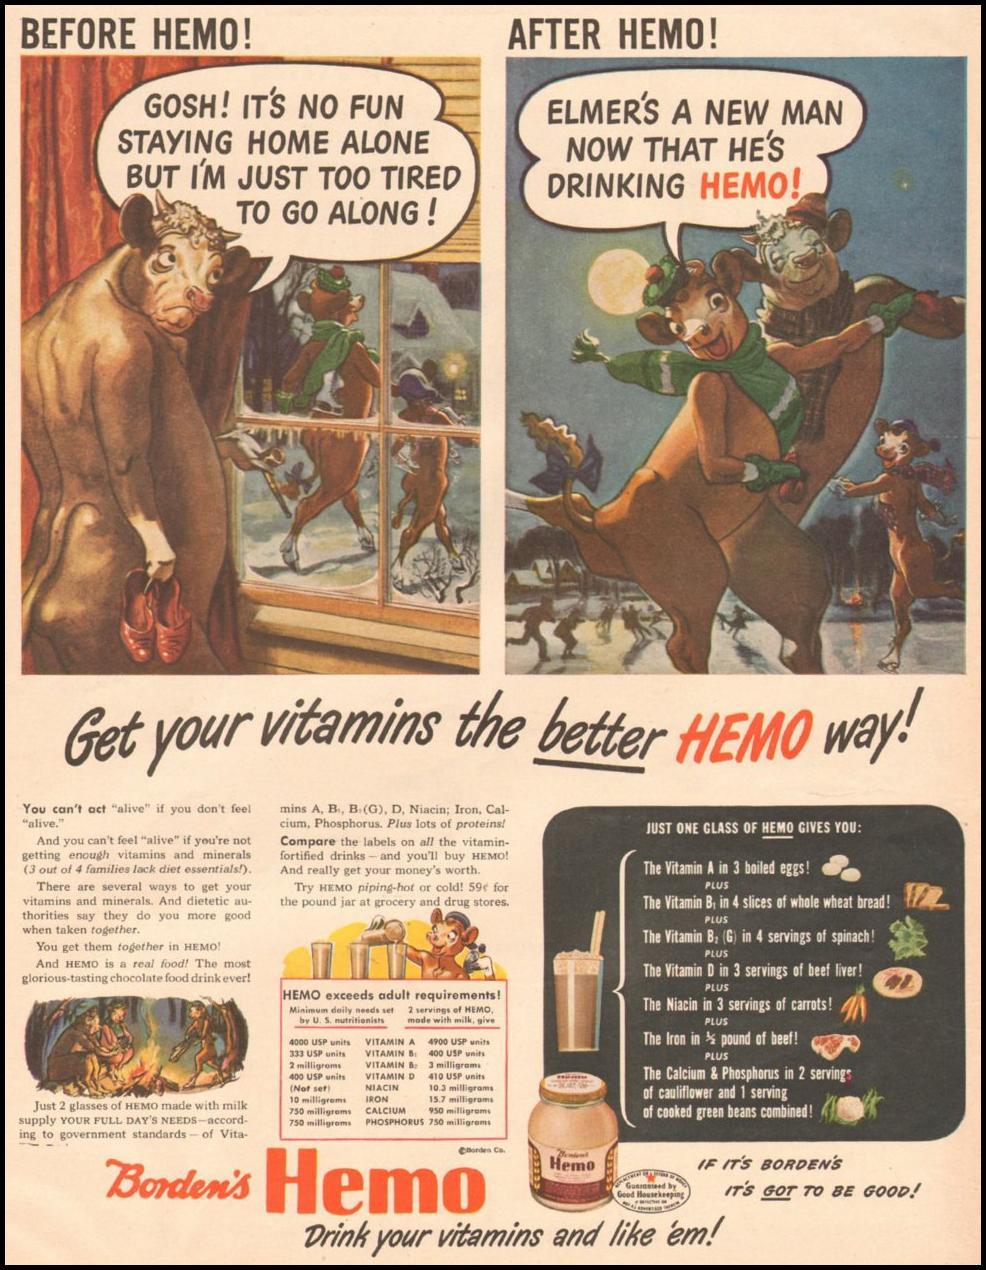 BORDEN'S HEMO LIFE 03/12/1945